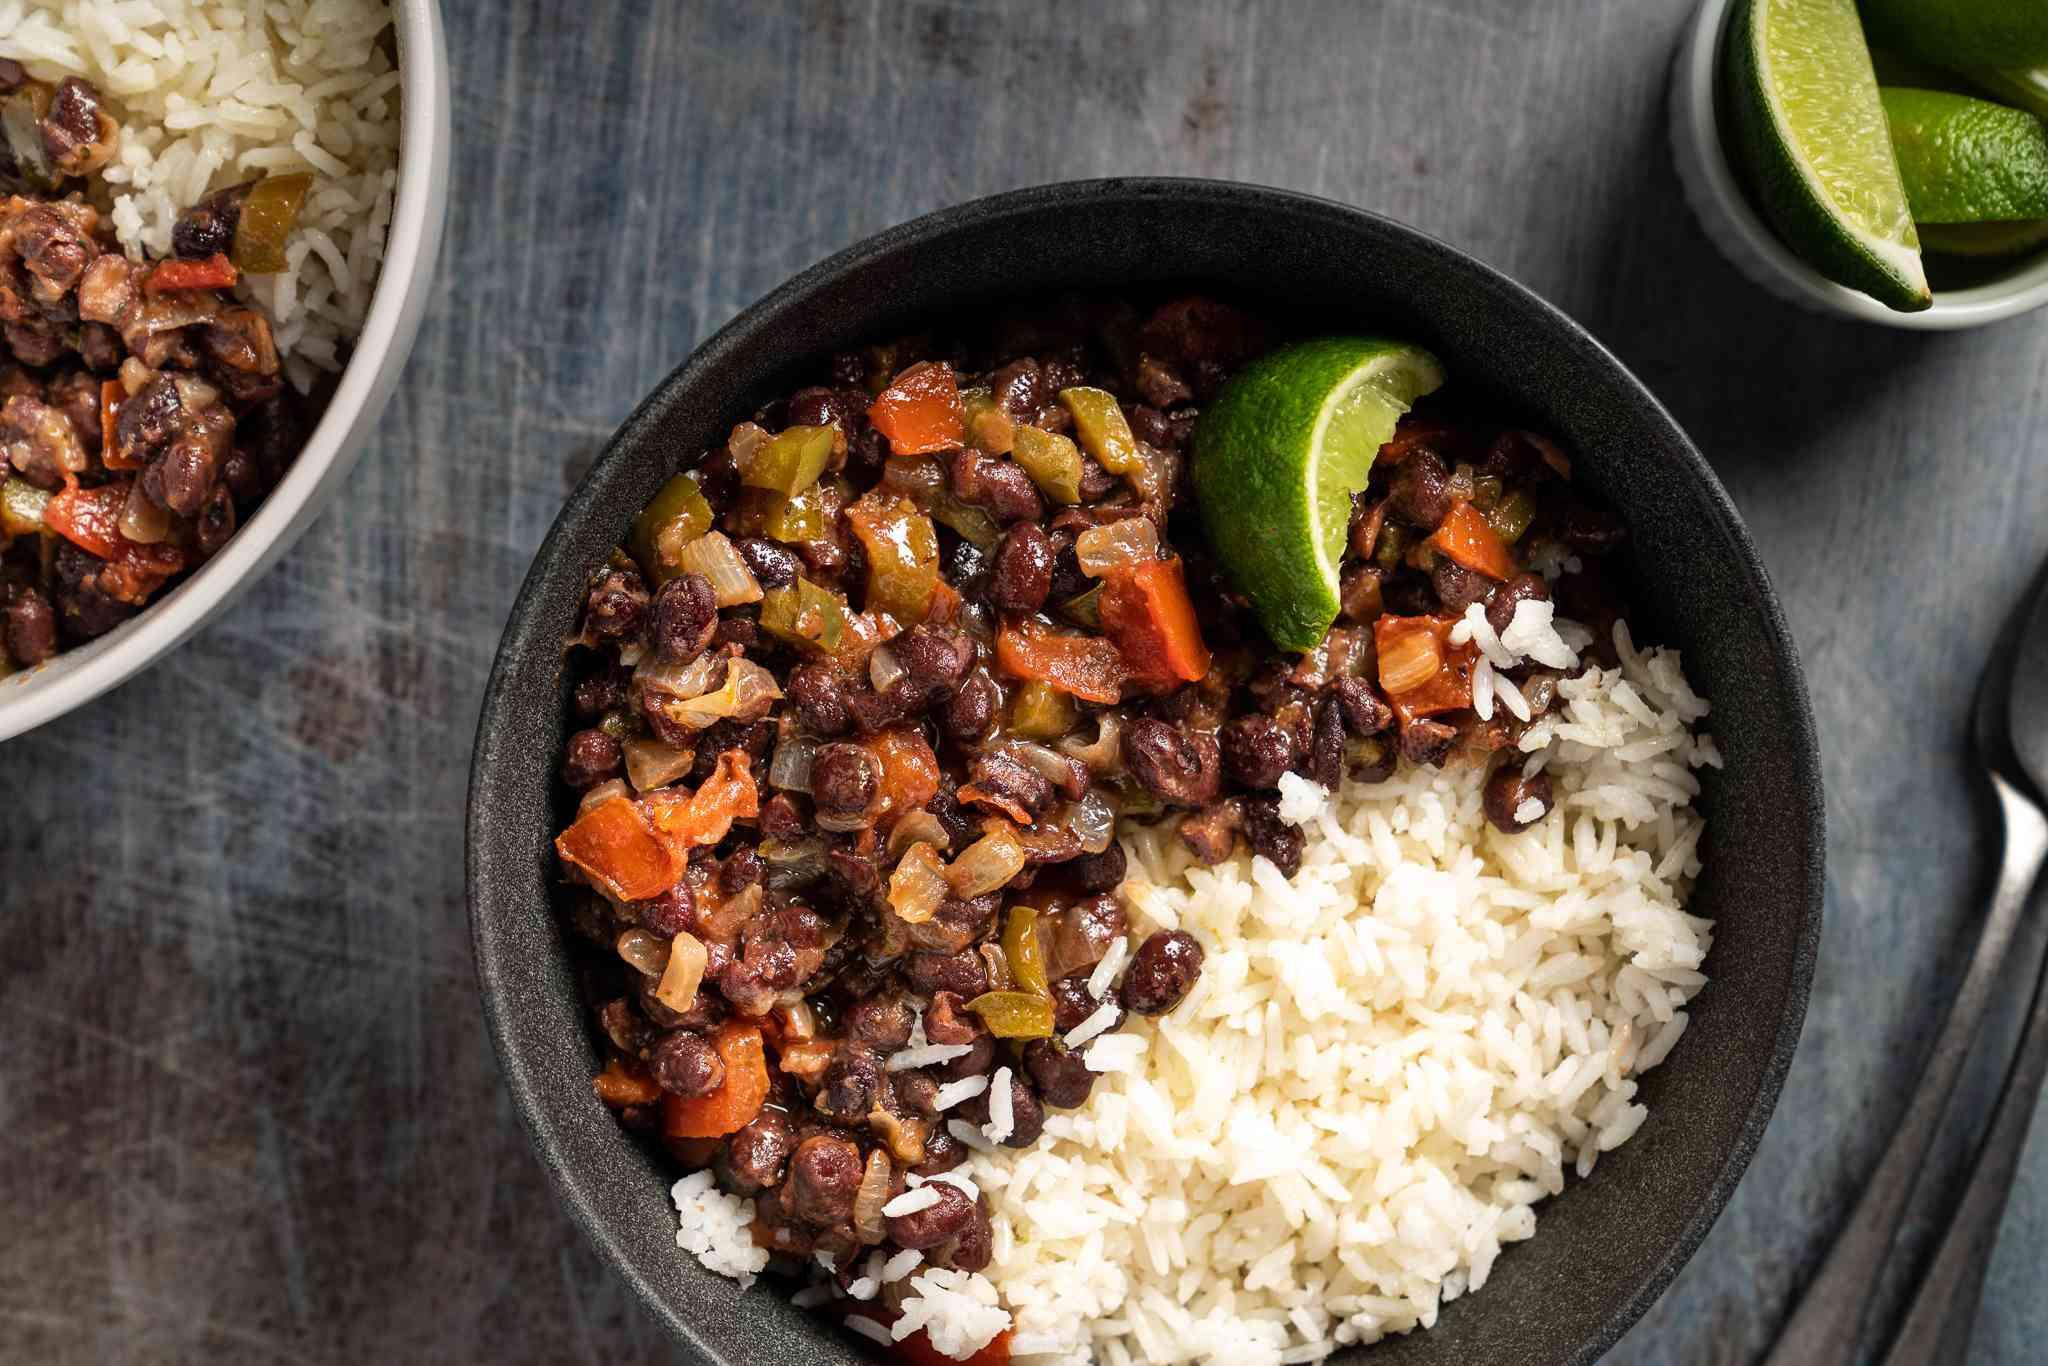 Basic Vegetarian Black Beans and Rice